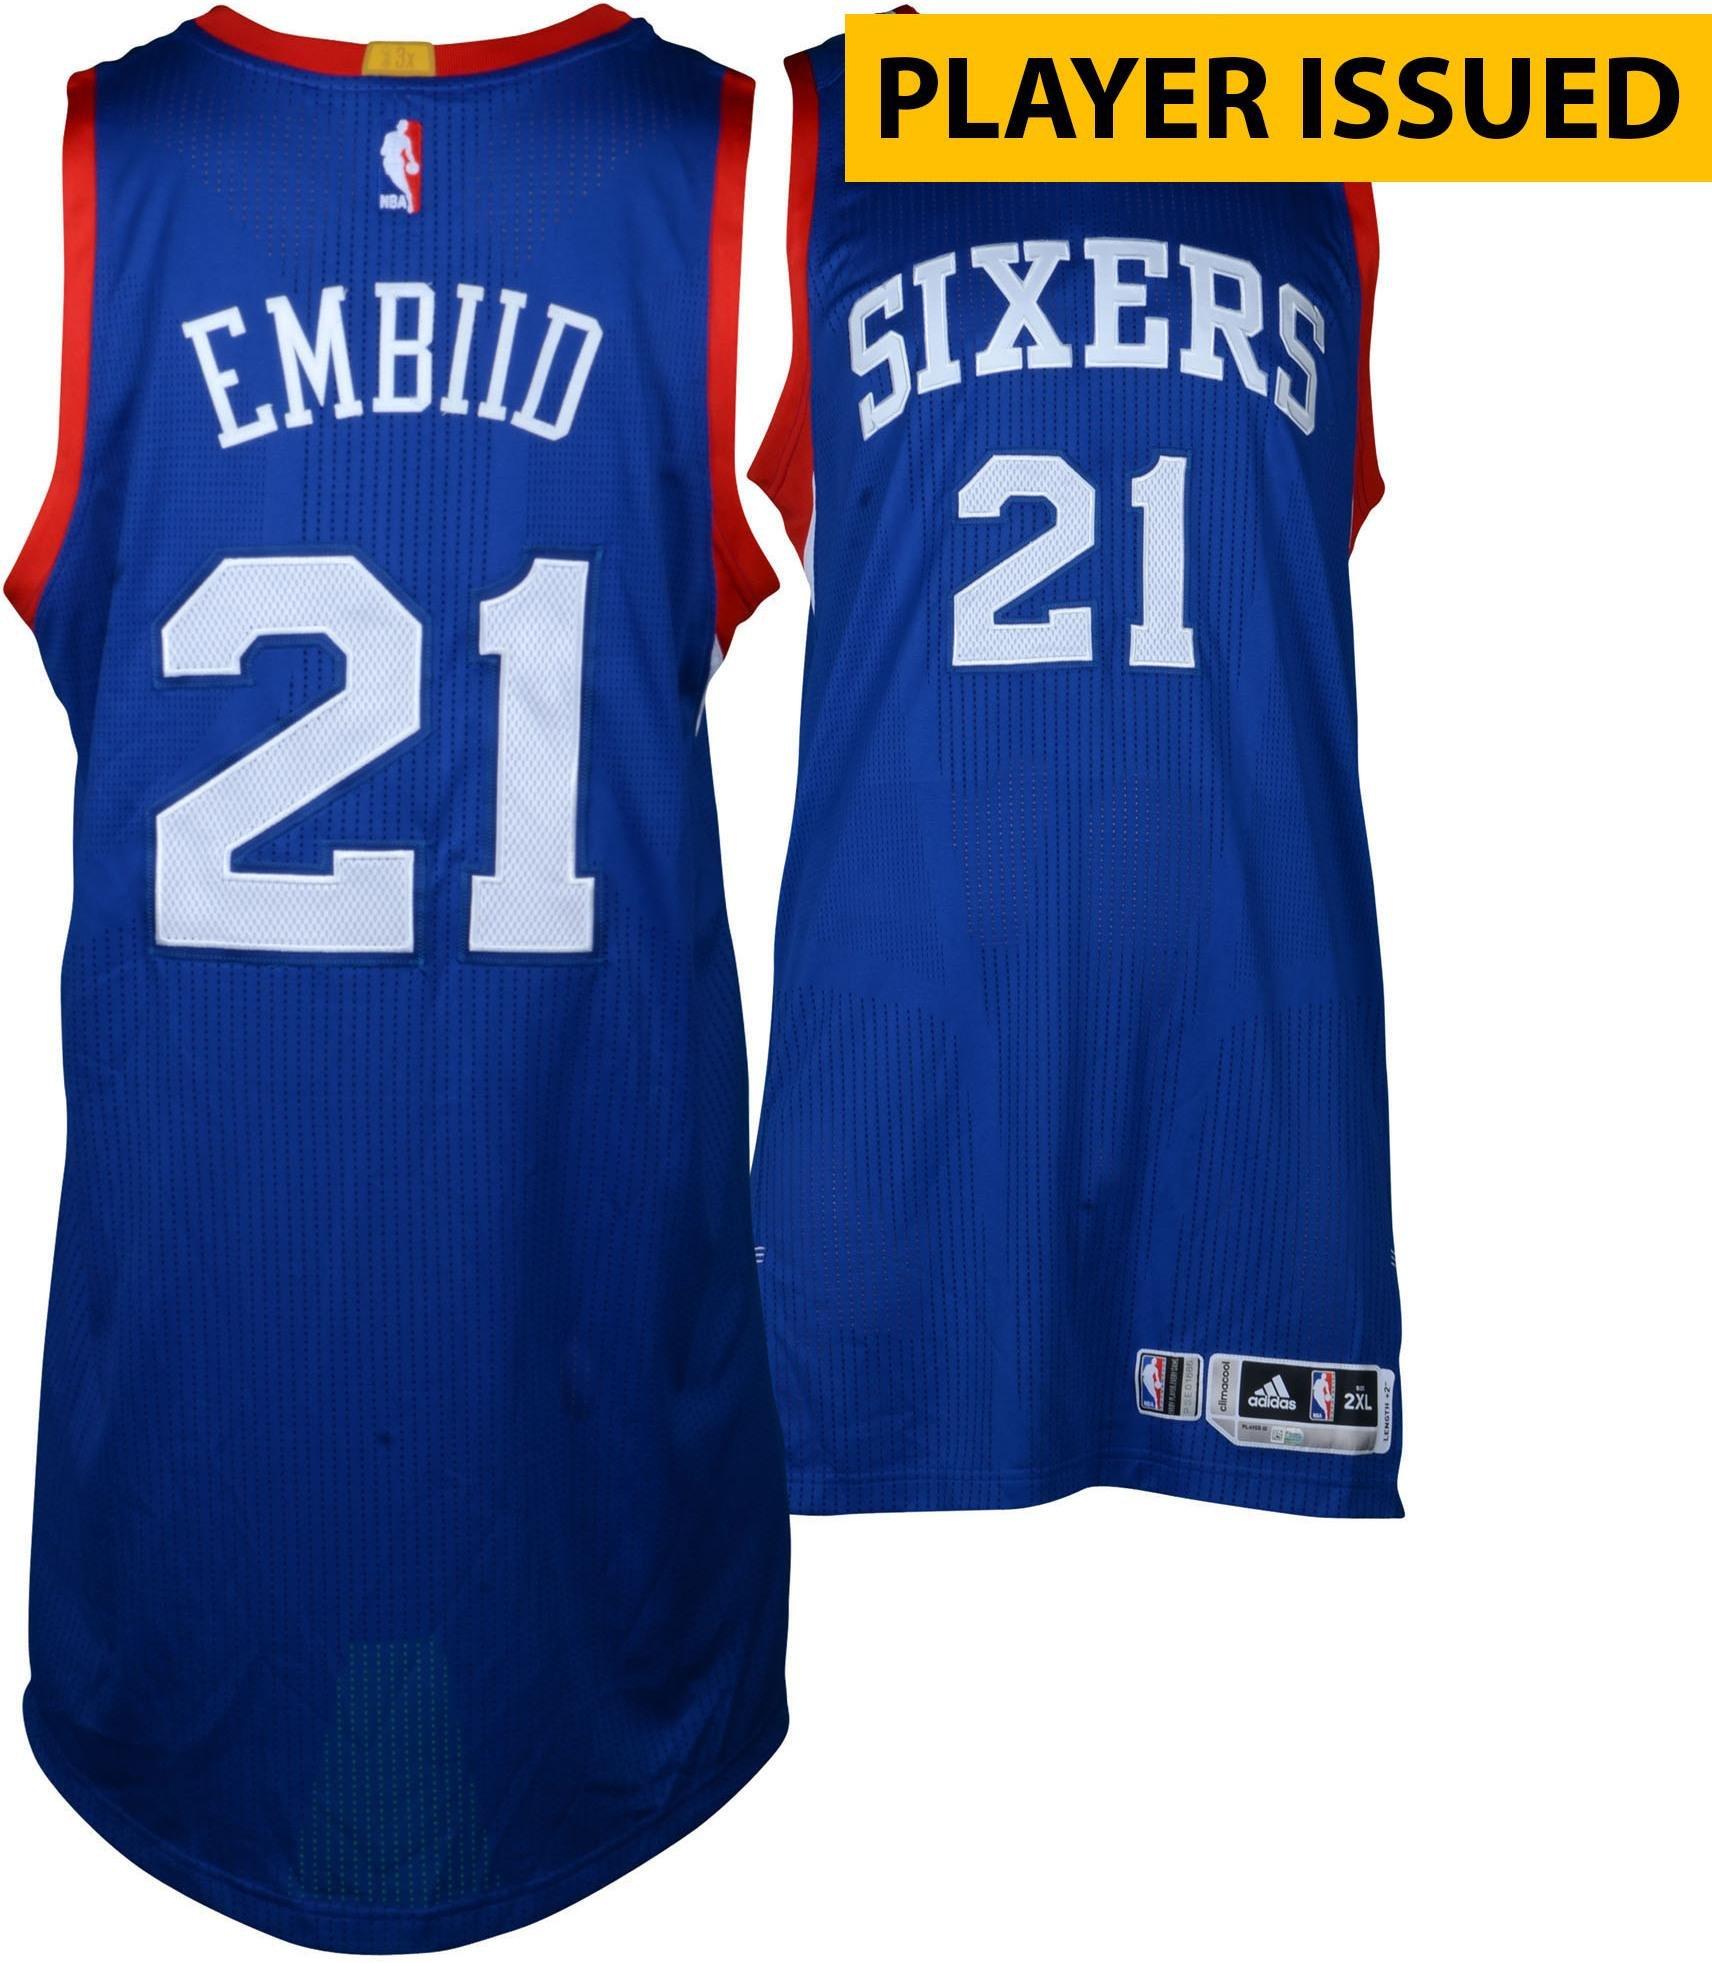 Joel Embiid Philadelphia 76ers Player-Issued  21 Blue Jersey from the  2014-15 NBA Season - Size ... cdbbac257